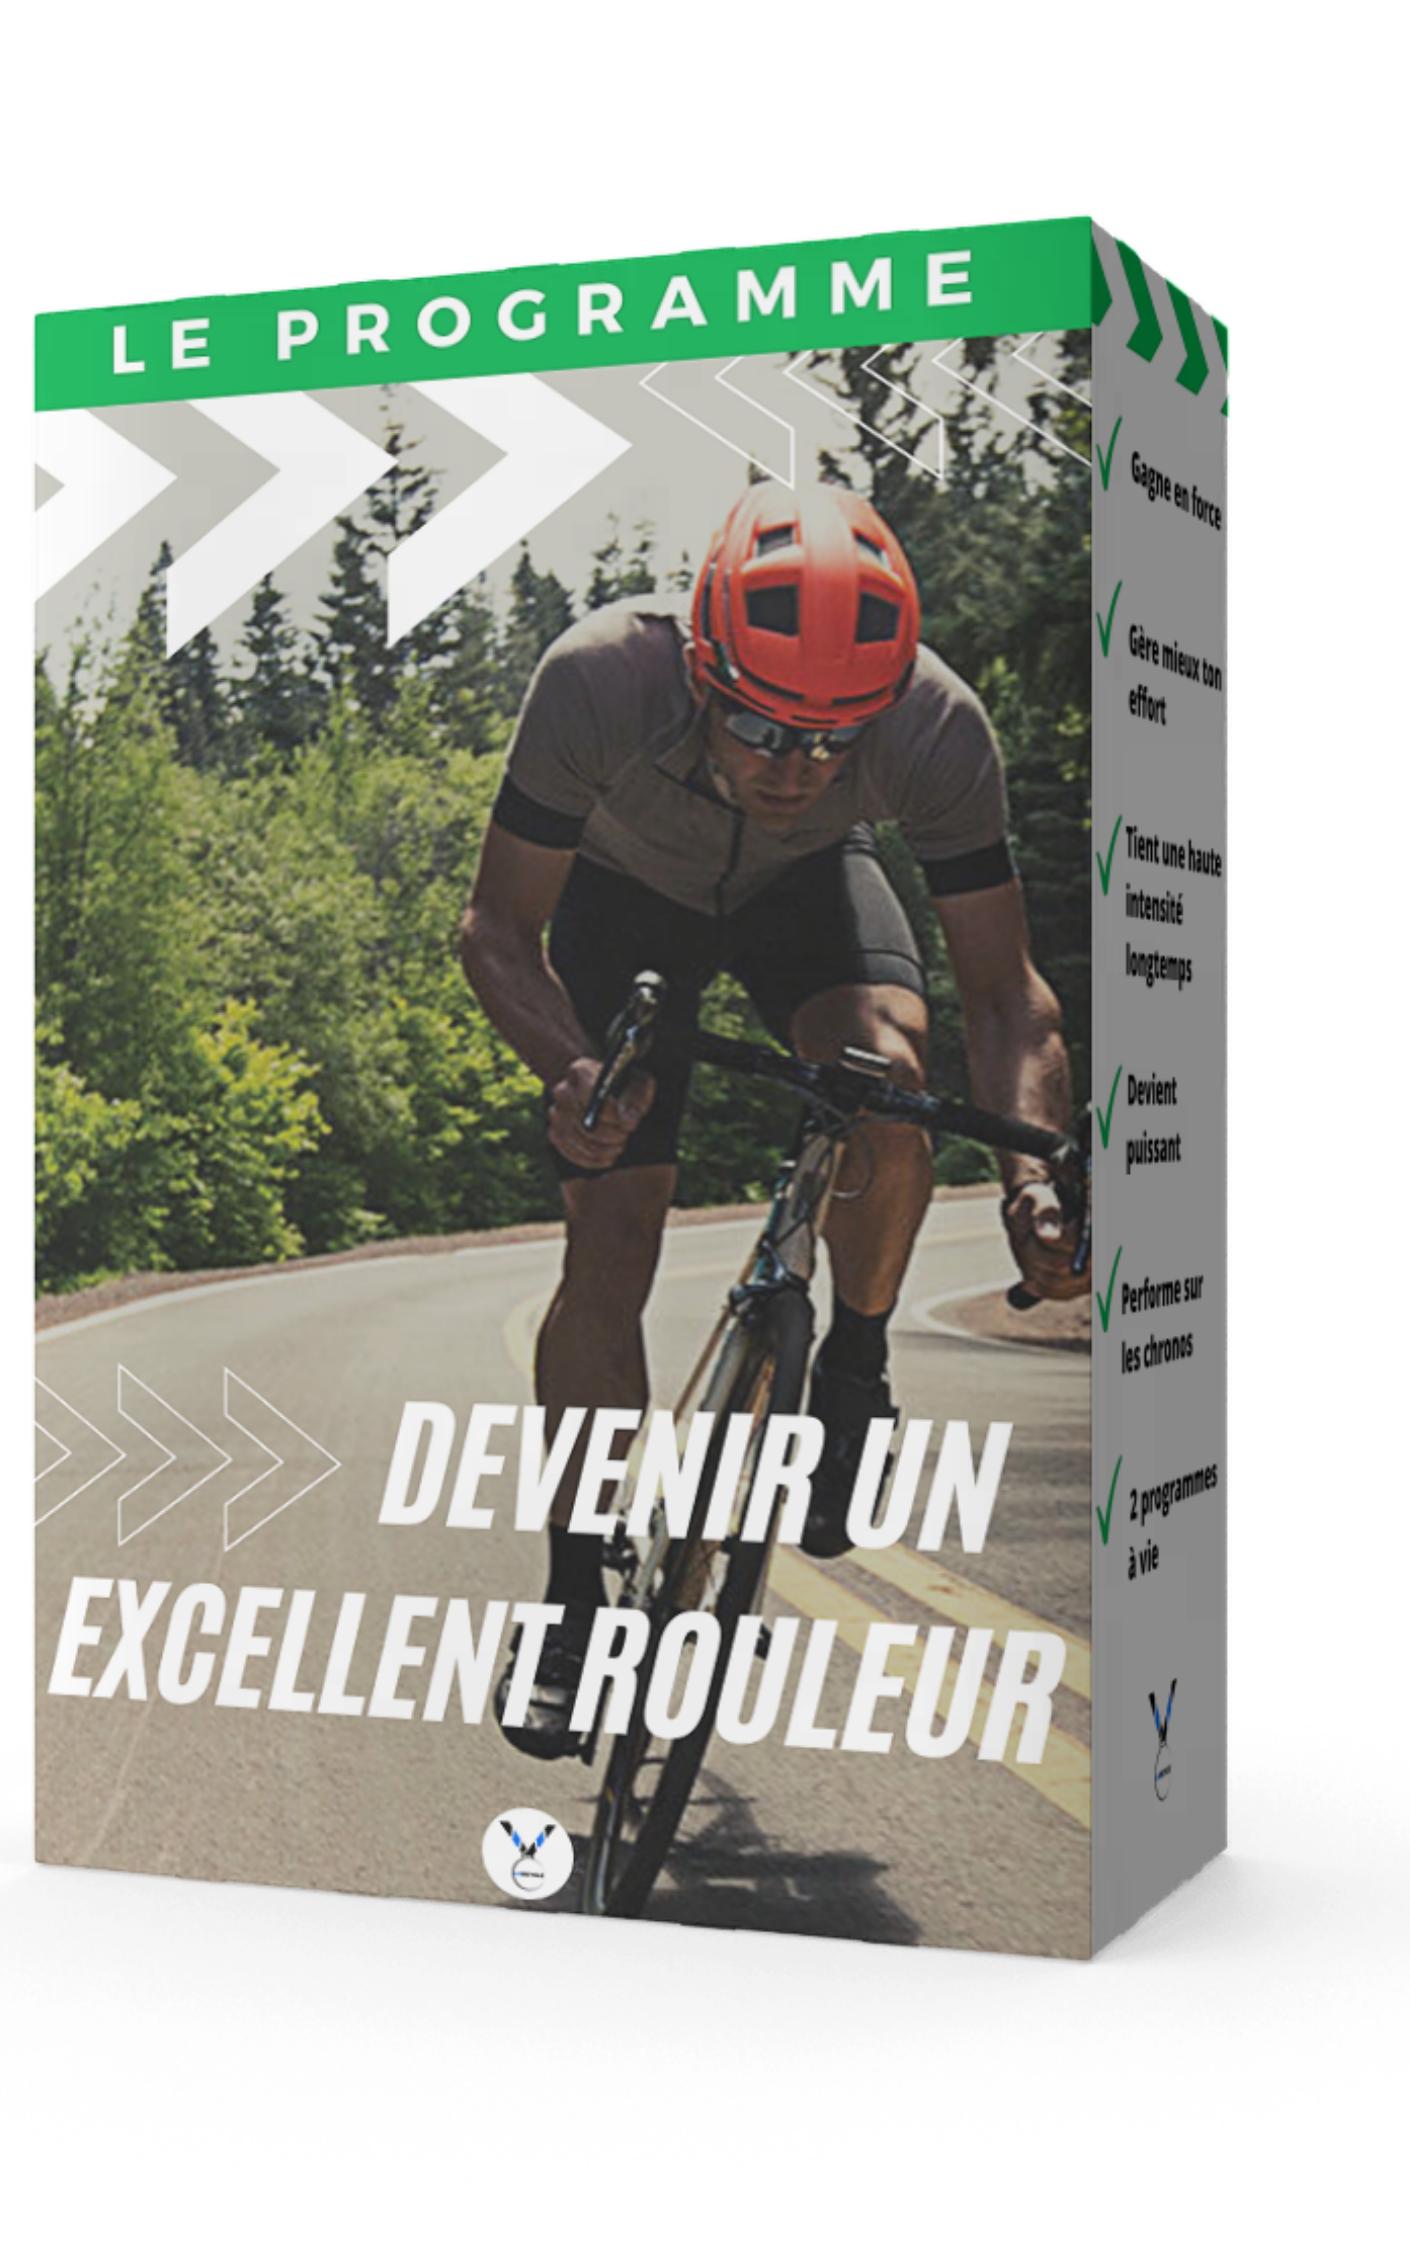 Programme cycliste pas chère